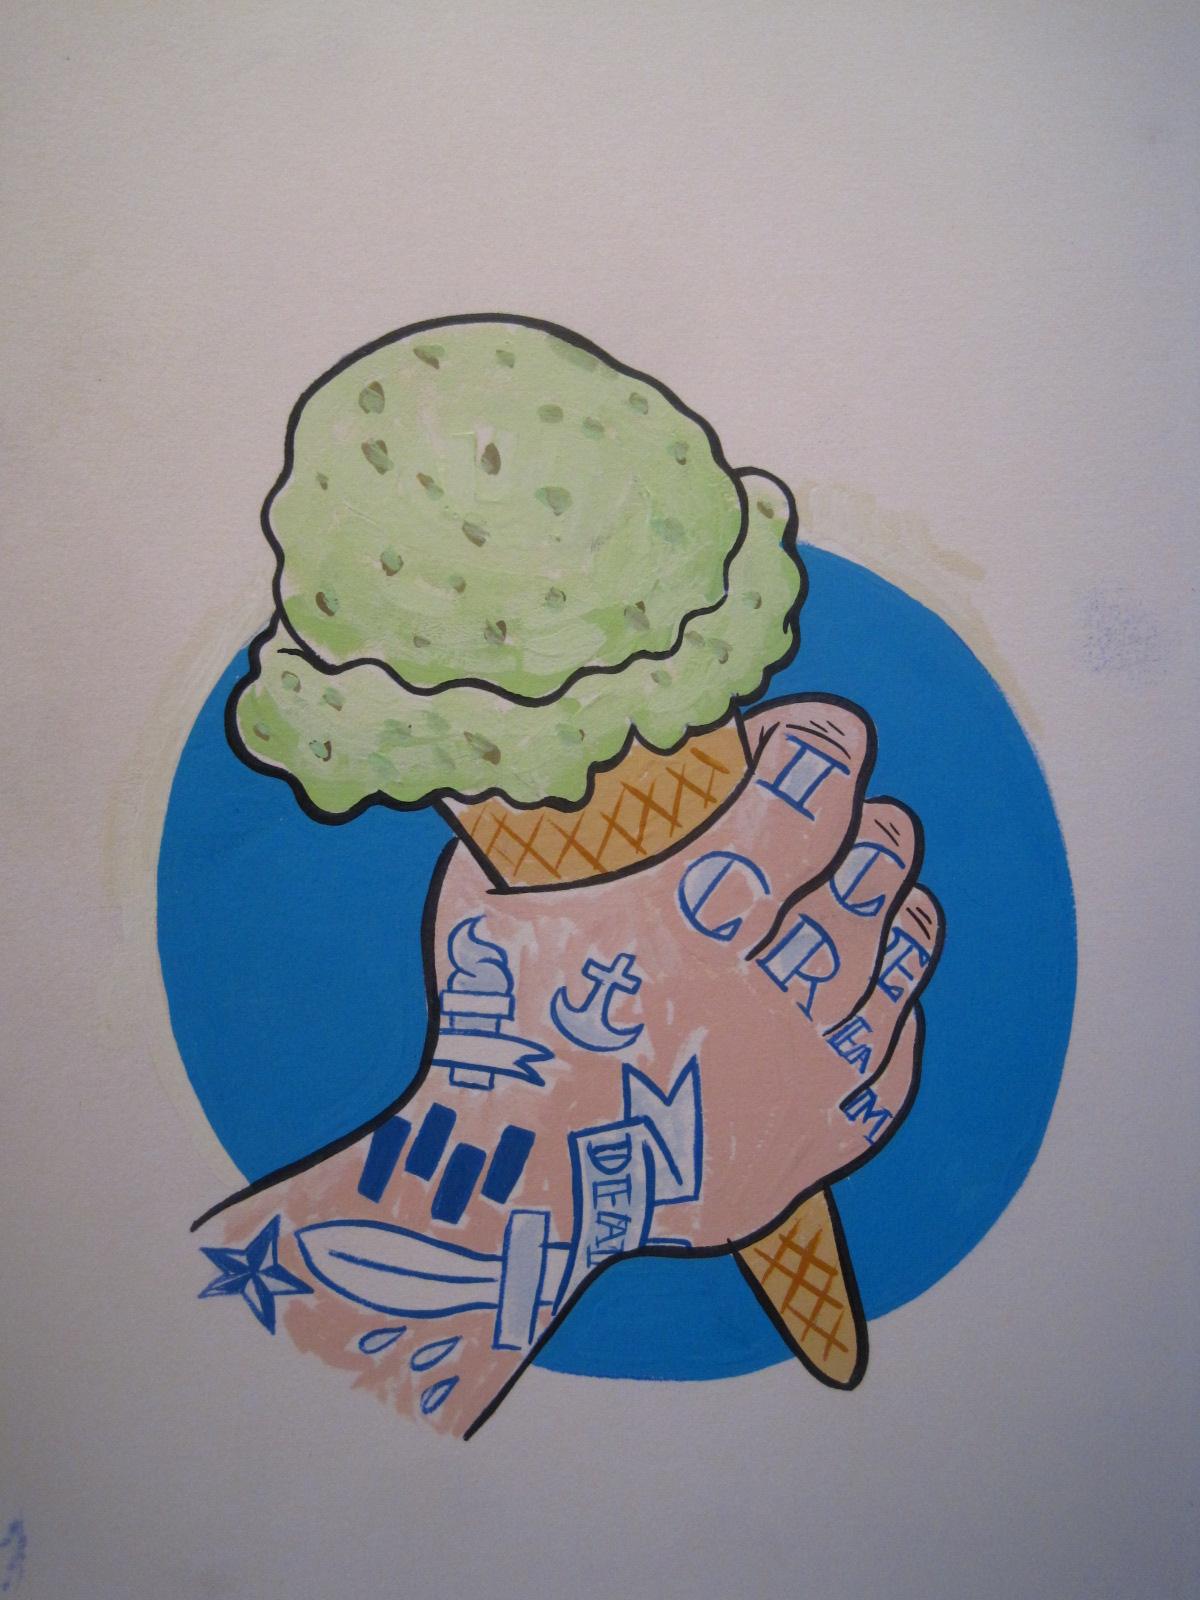 Punk rock ice cream! For Seattle Stranger. $39.